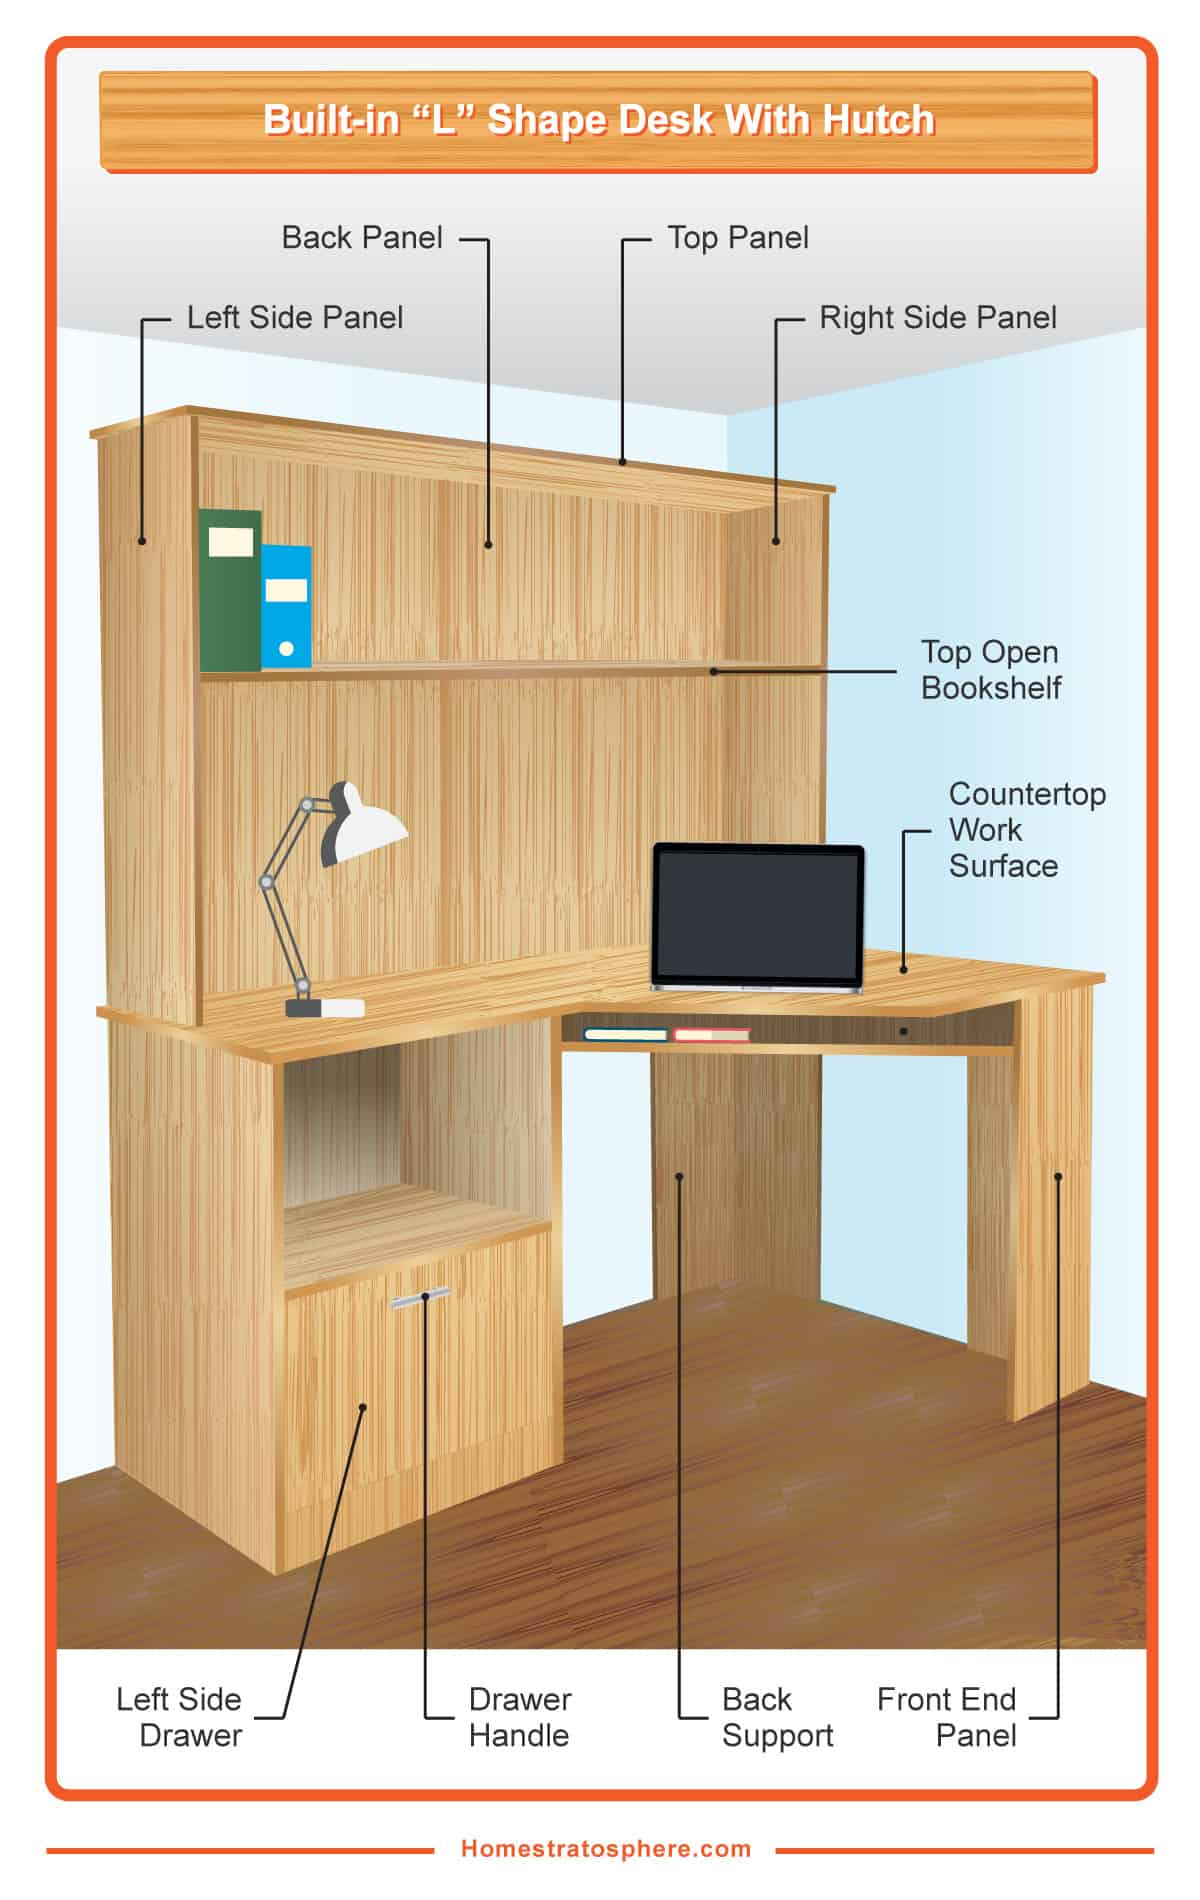 Anatomy of a desk with hutch